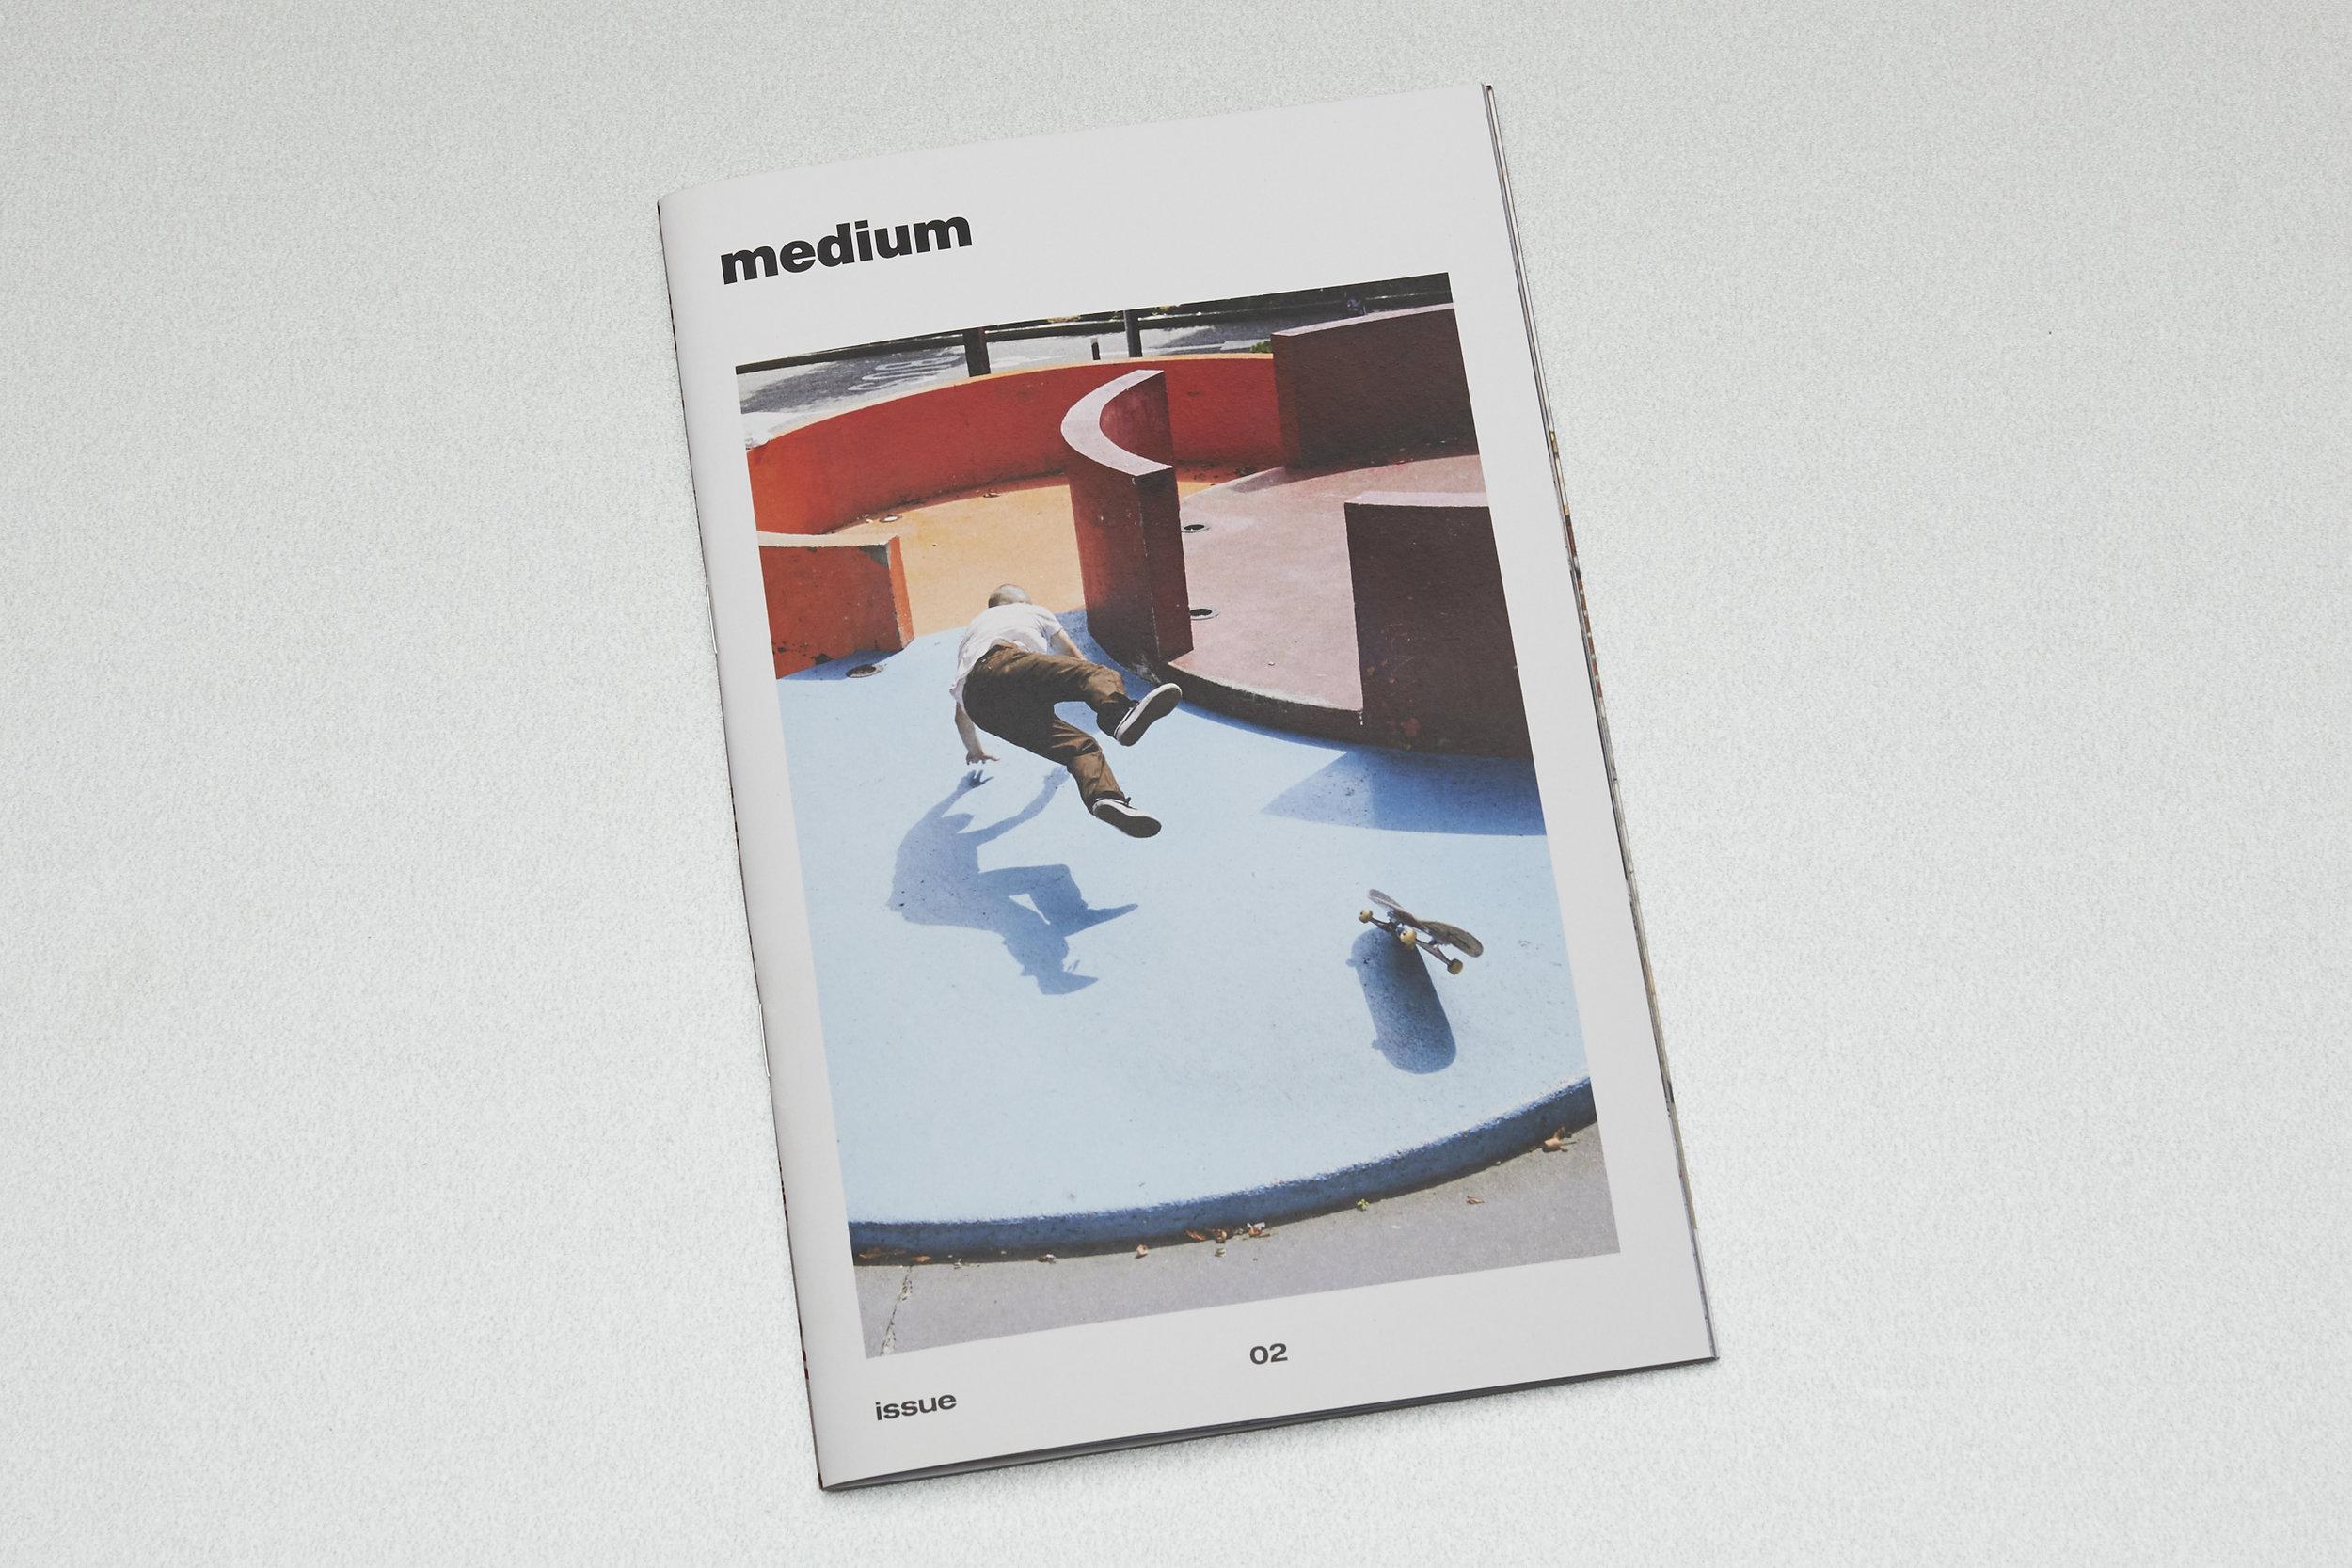 medium skate mag_issue two_stock images_001.jpg